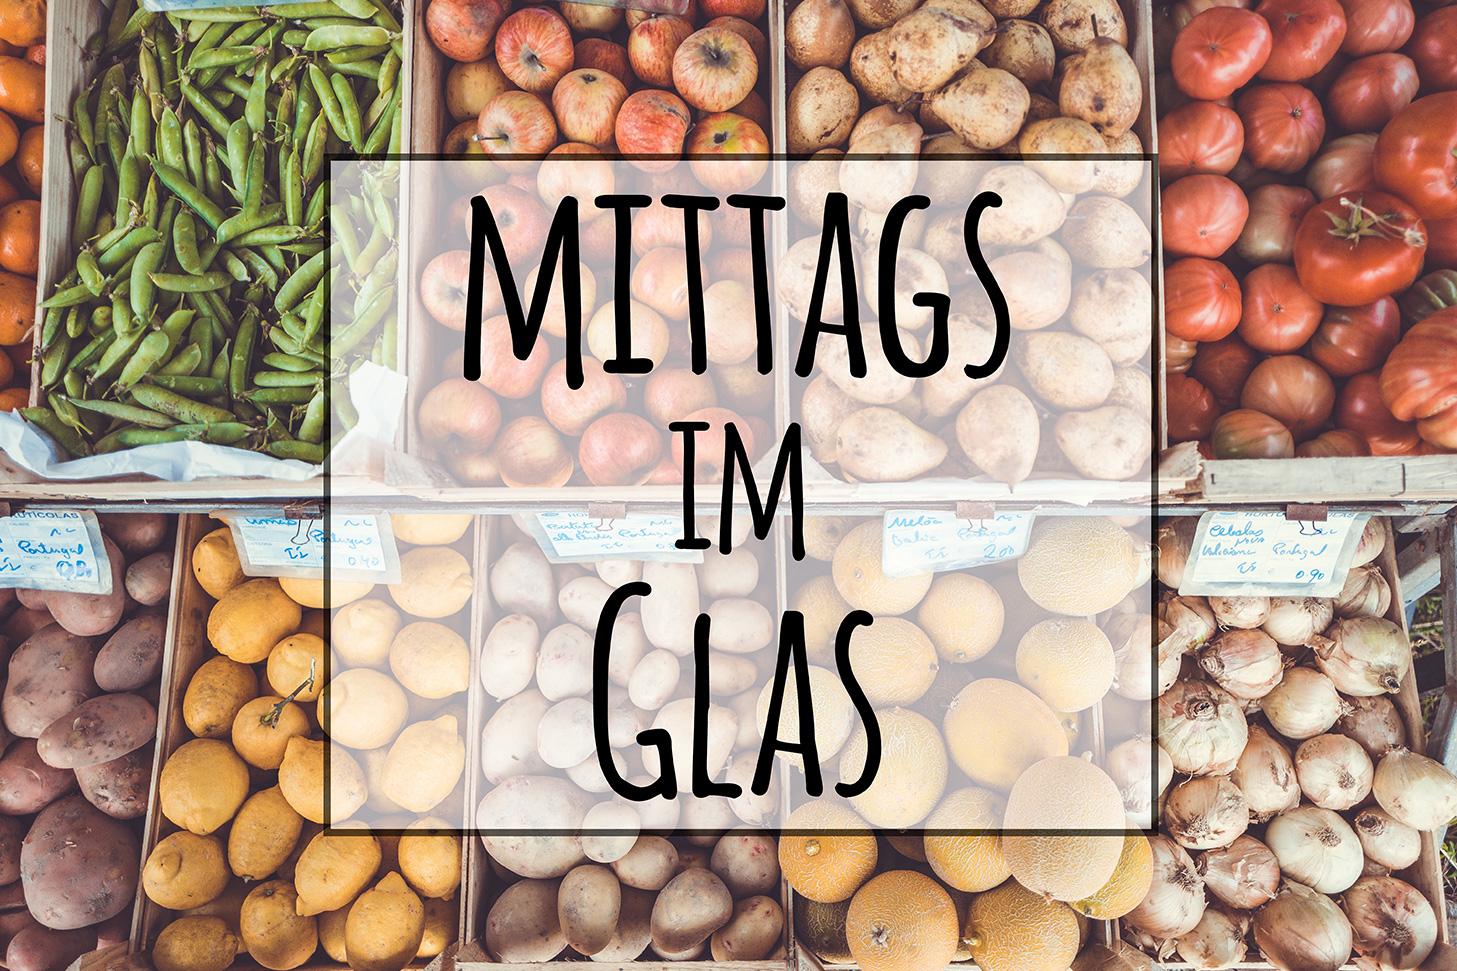 Mittags-Im-Glas